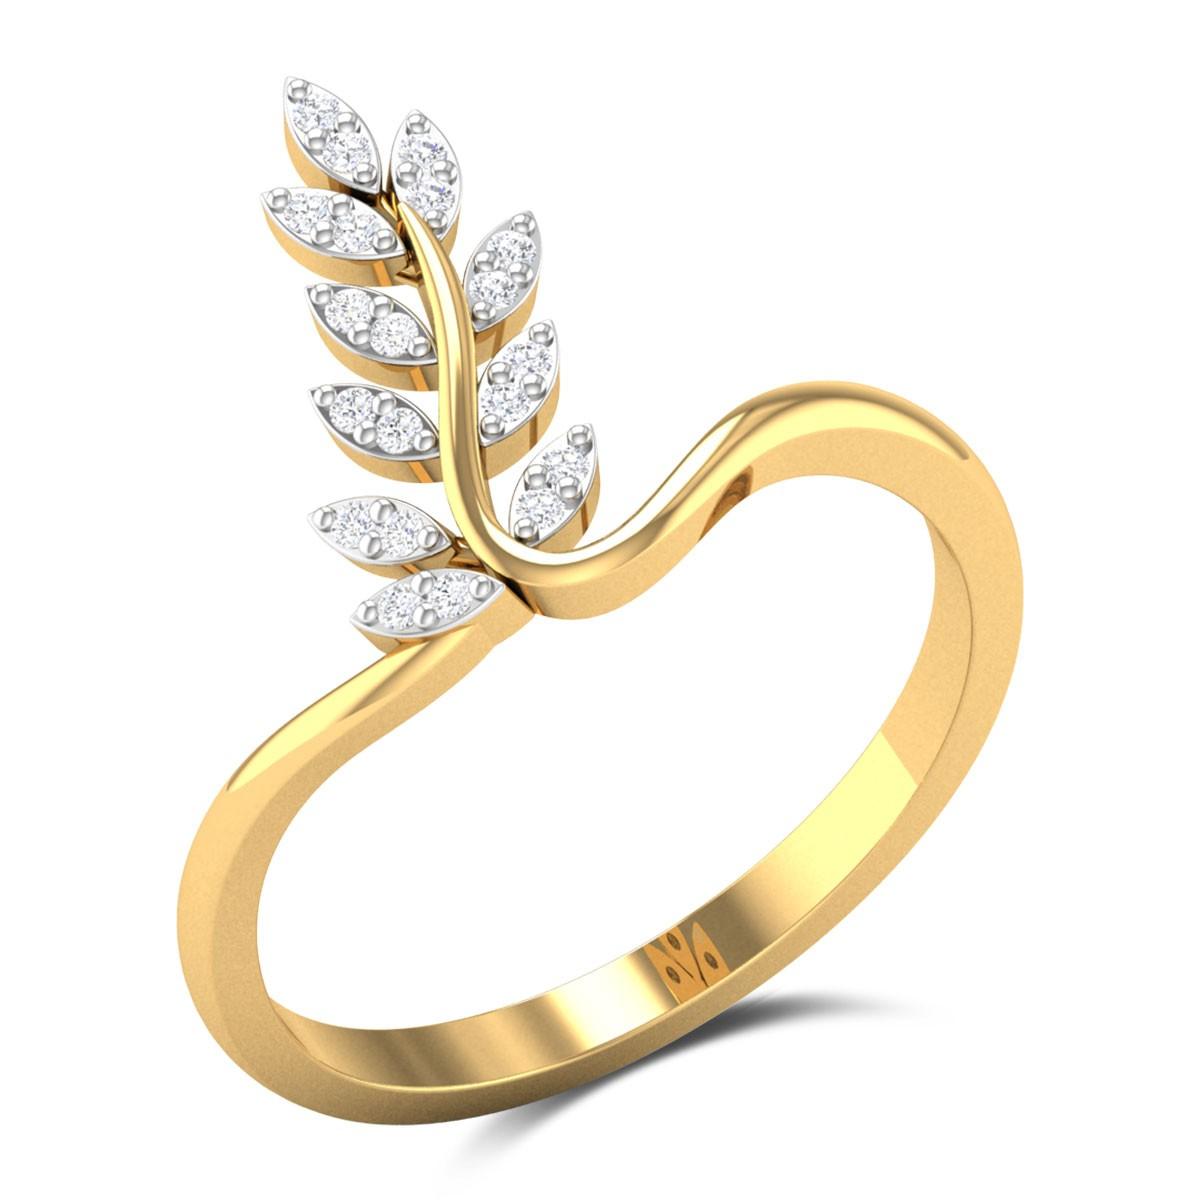 Carrigan Diamond Ring